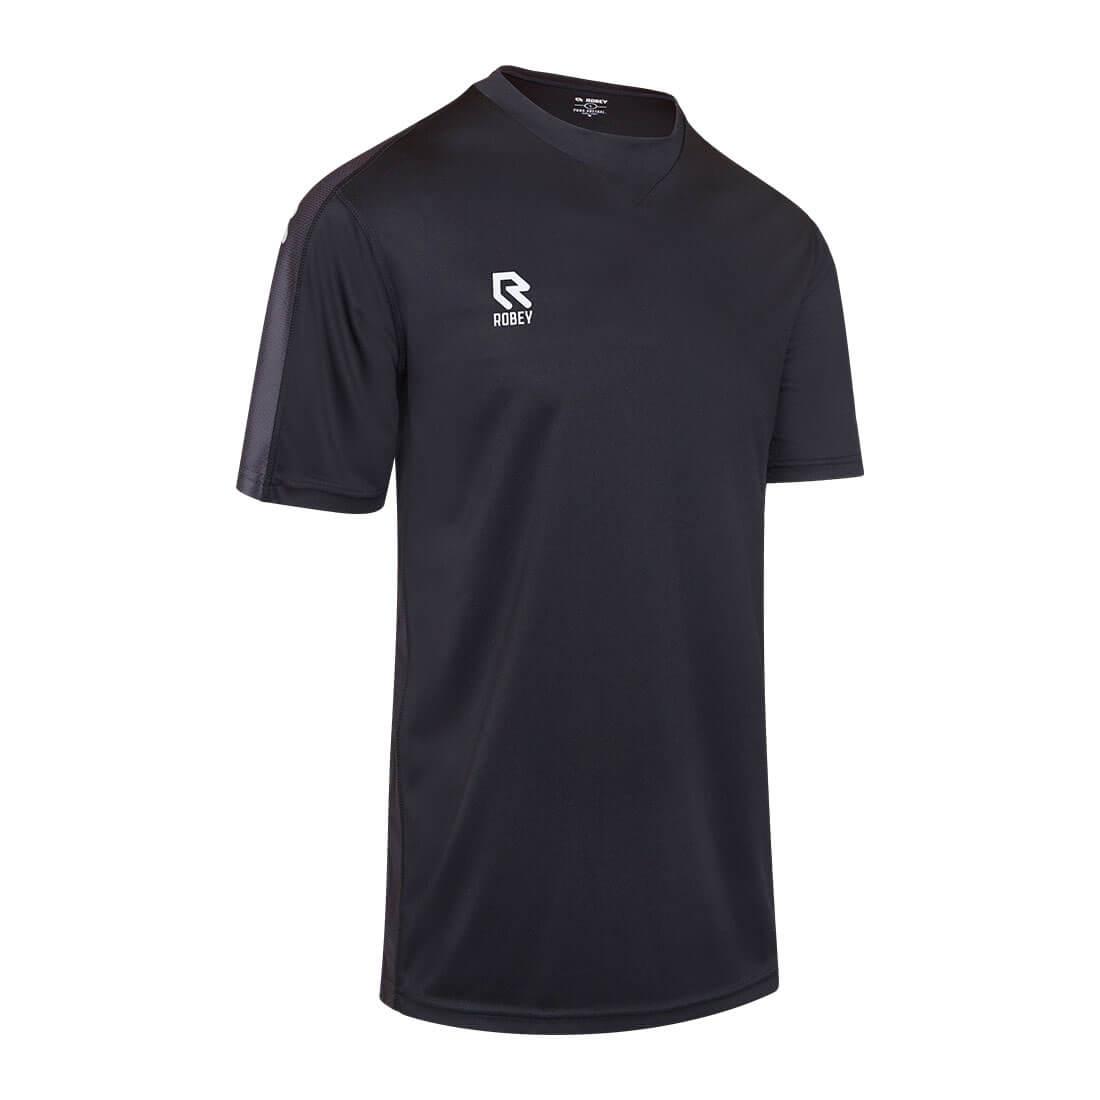 Robey Performance Shirt - Black